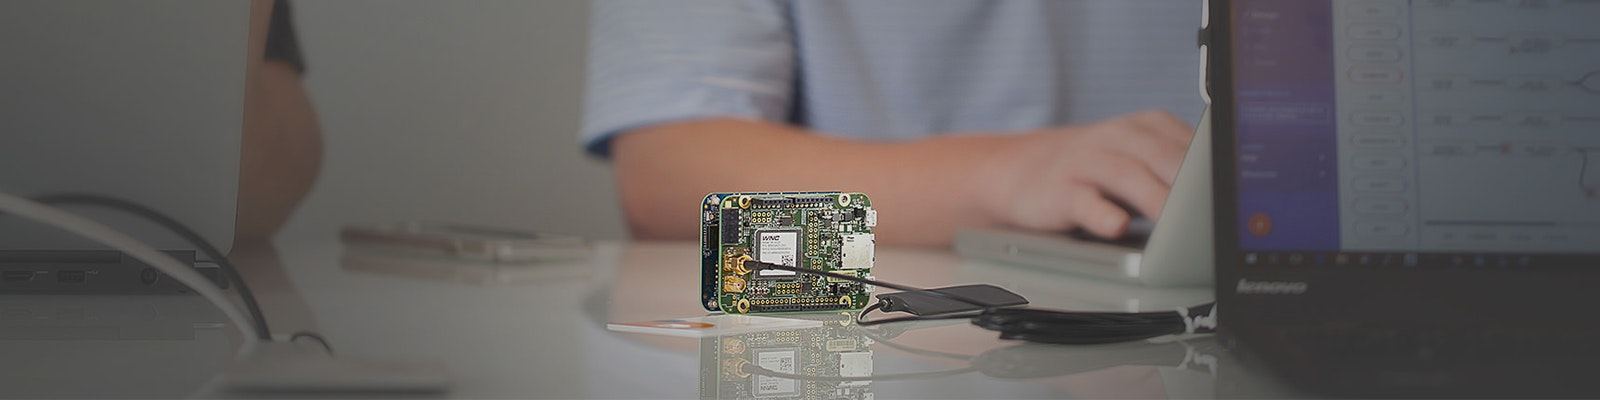 Realtime AT&T IoT StarterKit challenge